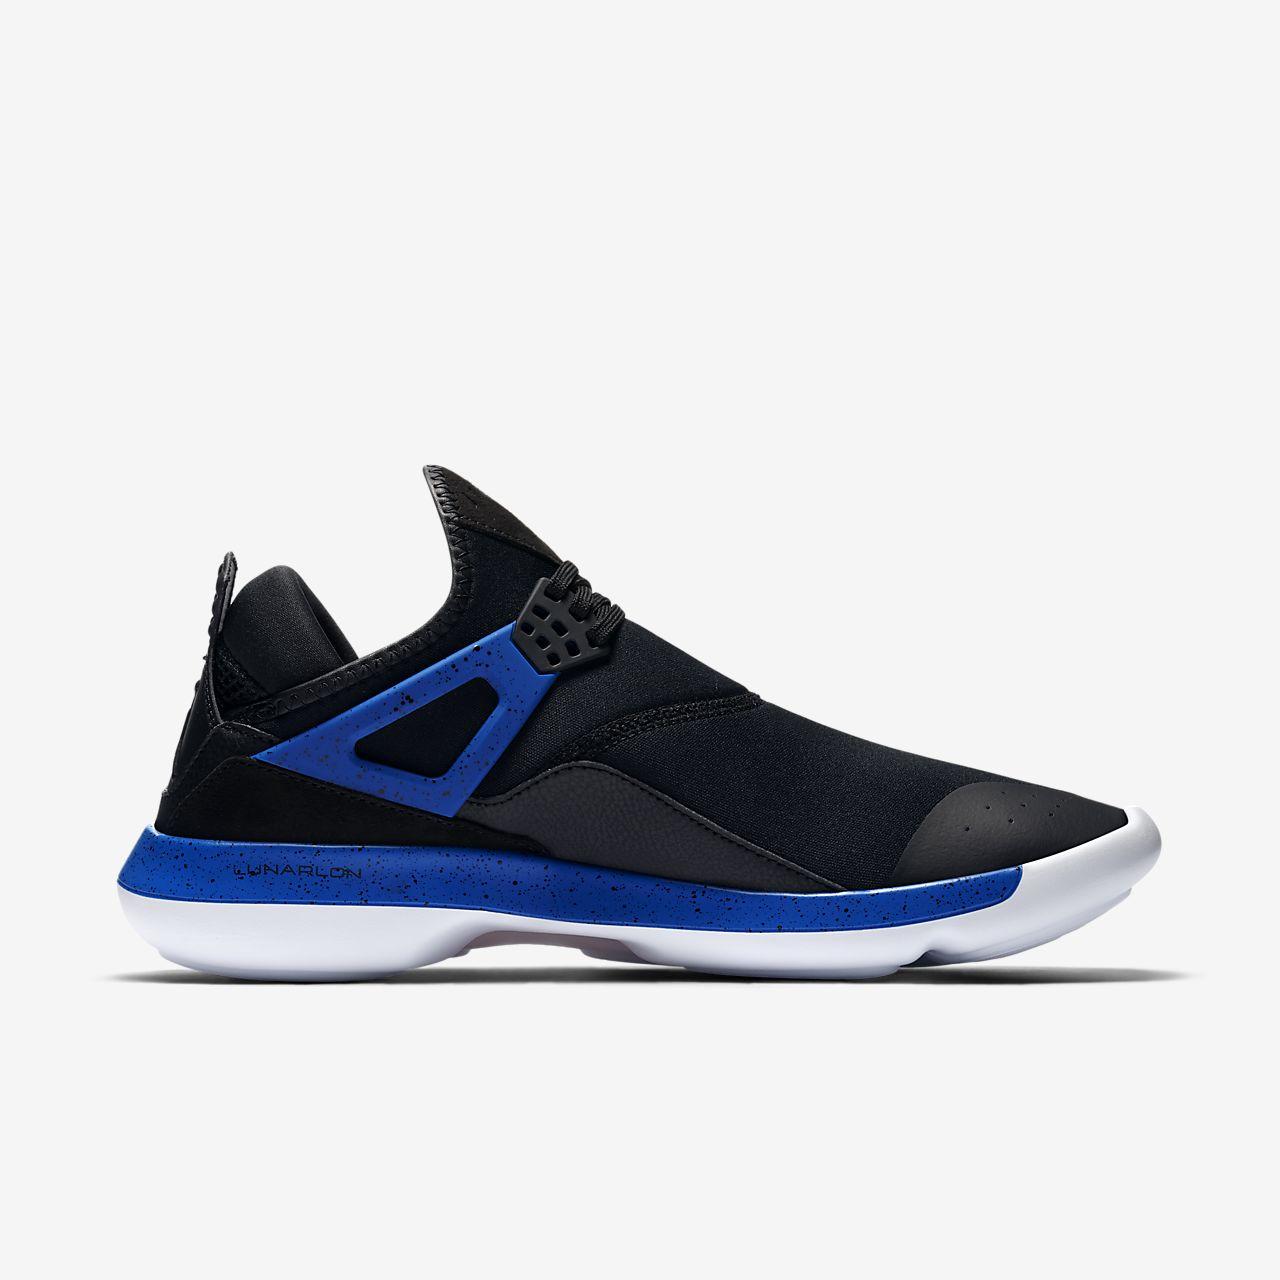 Nike Air Jordan FLY 89 Scarpe sportive uomo 940267 Scarpe da tennis 006